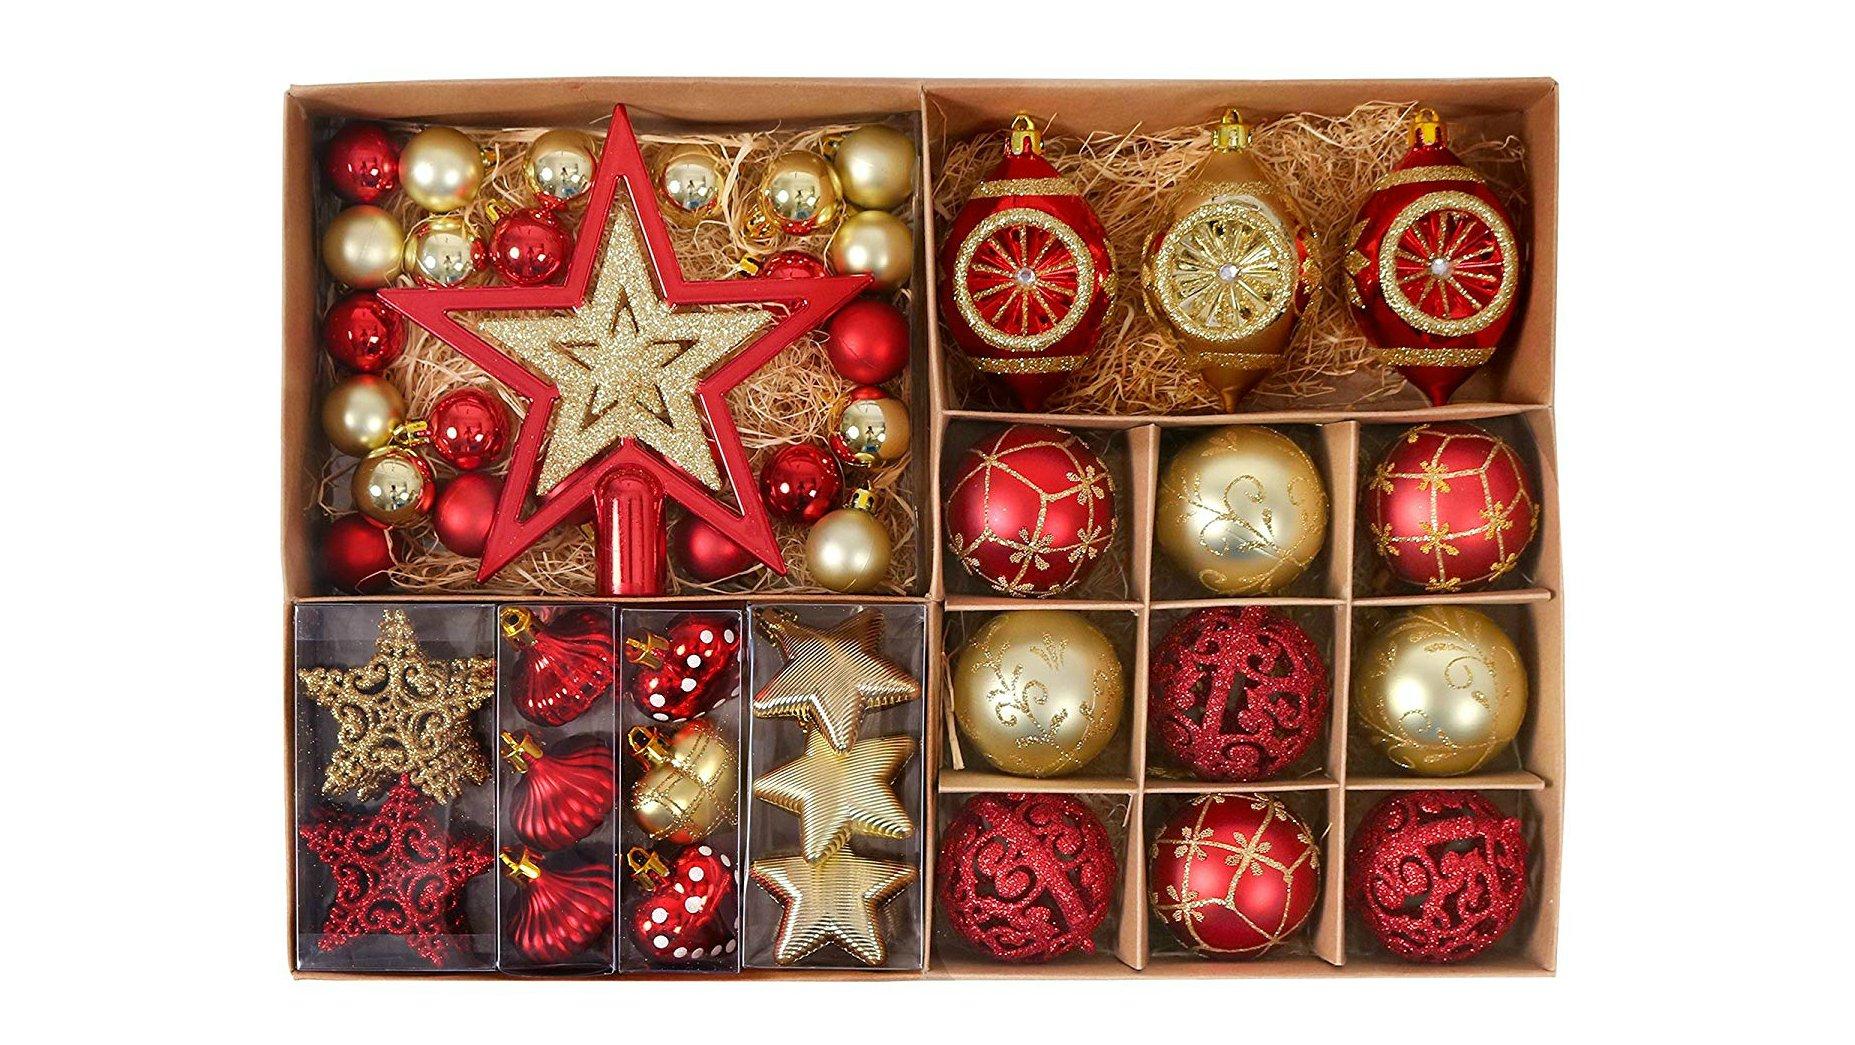 Best Christmas Tree Decorations 2019: Stylish Xmas Props